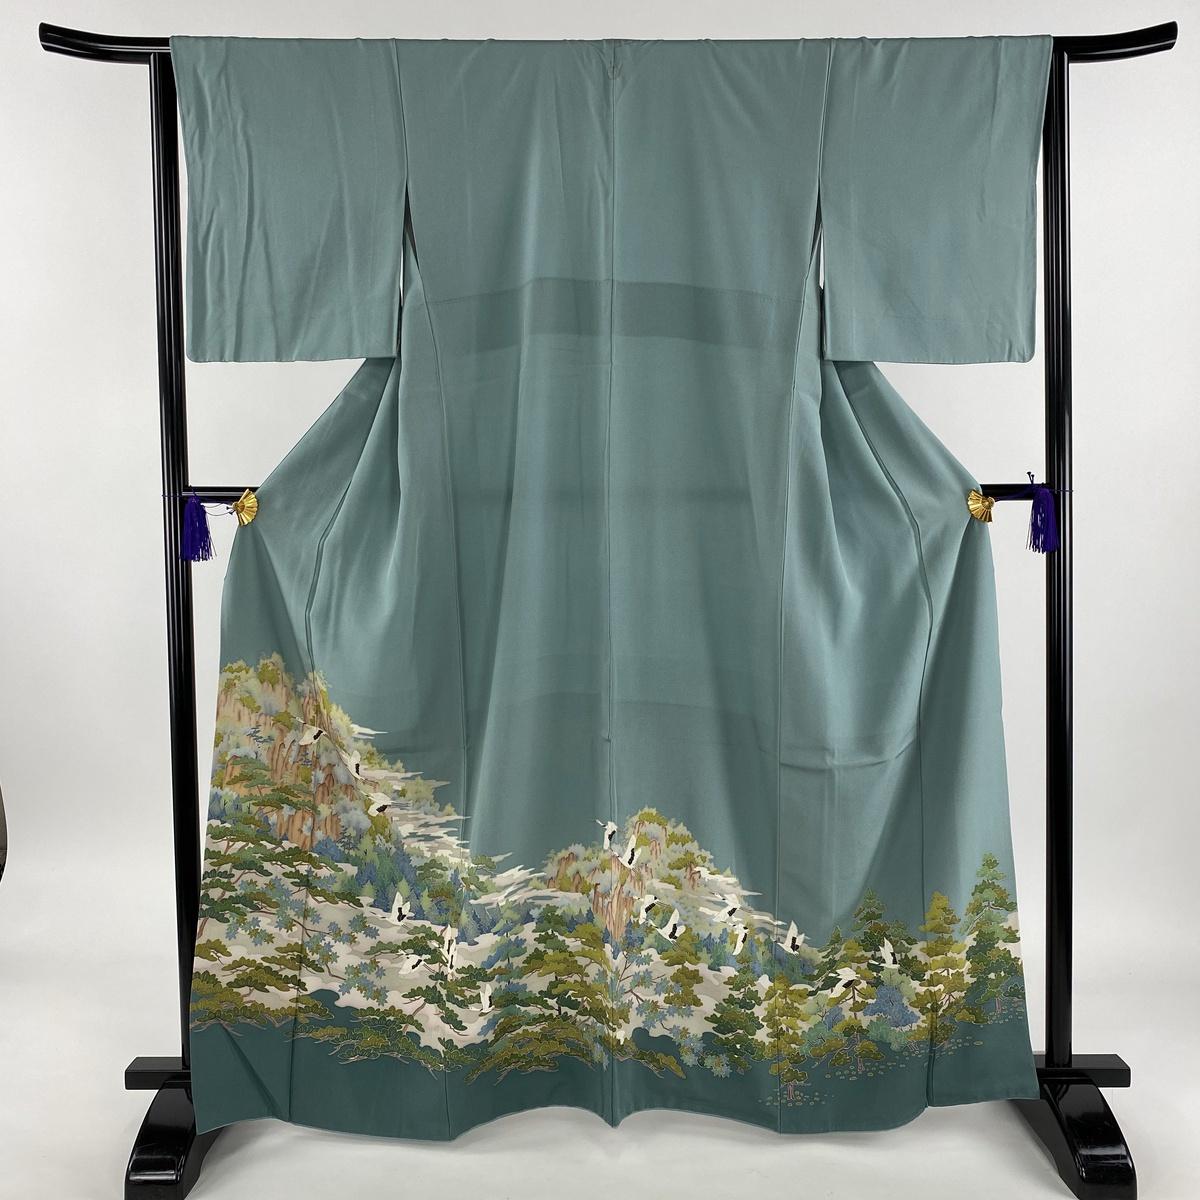 色留袖 美品 秀品 一つ紋 樹木 鶴 染め分け 薄緑 袷 身丈164cm 裄丈63.5cm S 正絹 【中古】